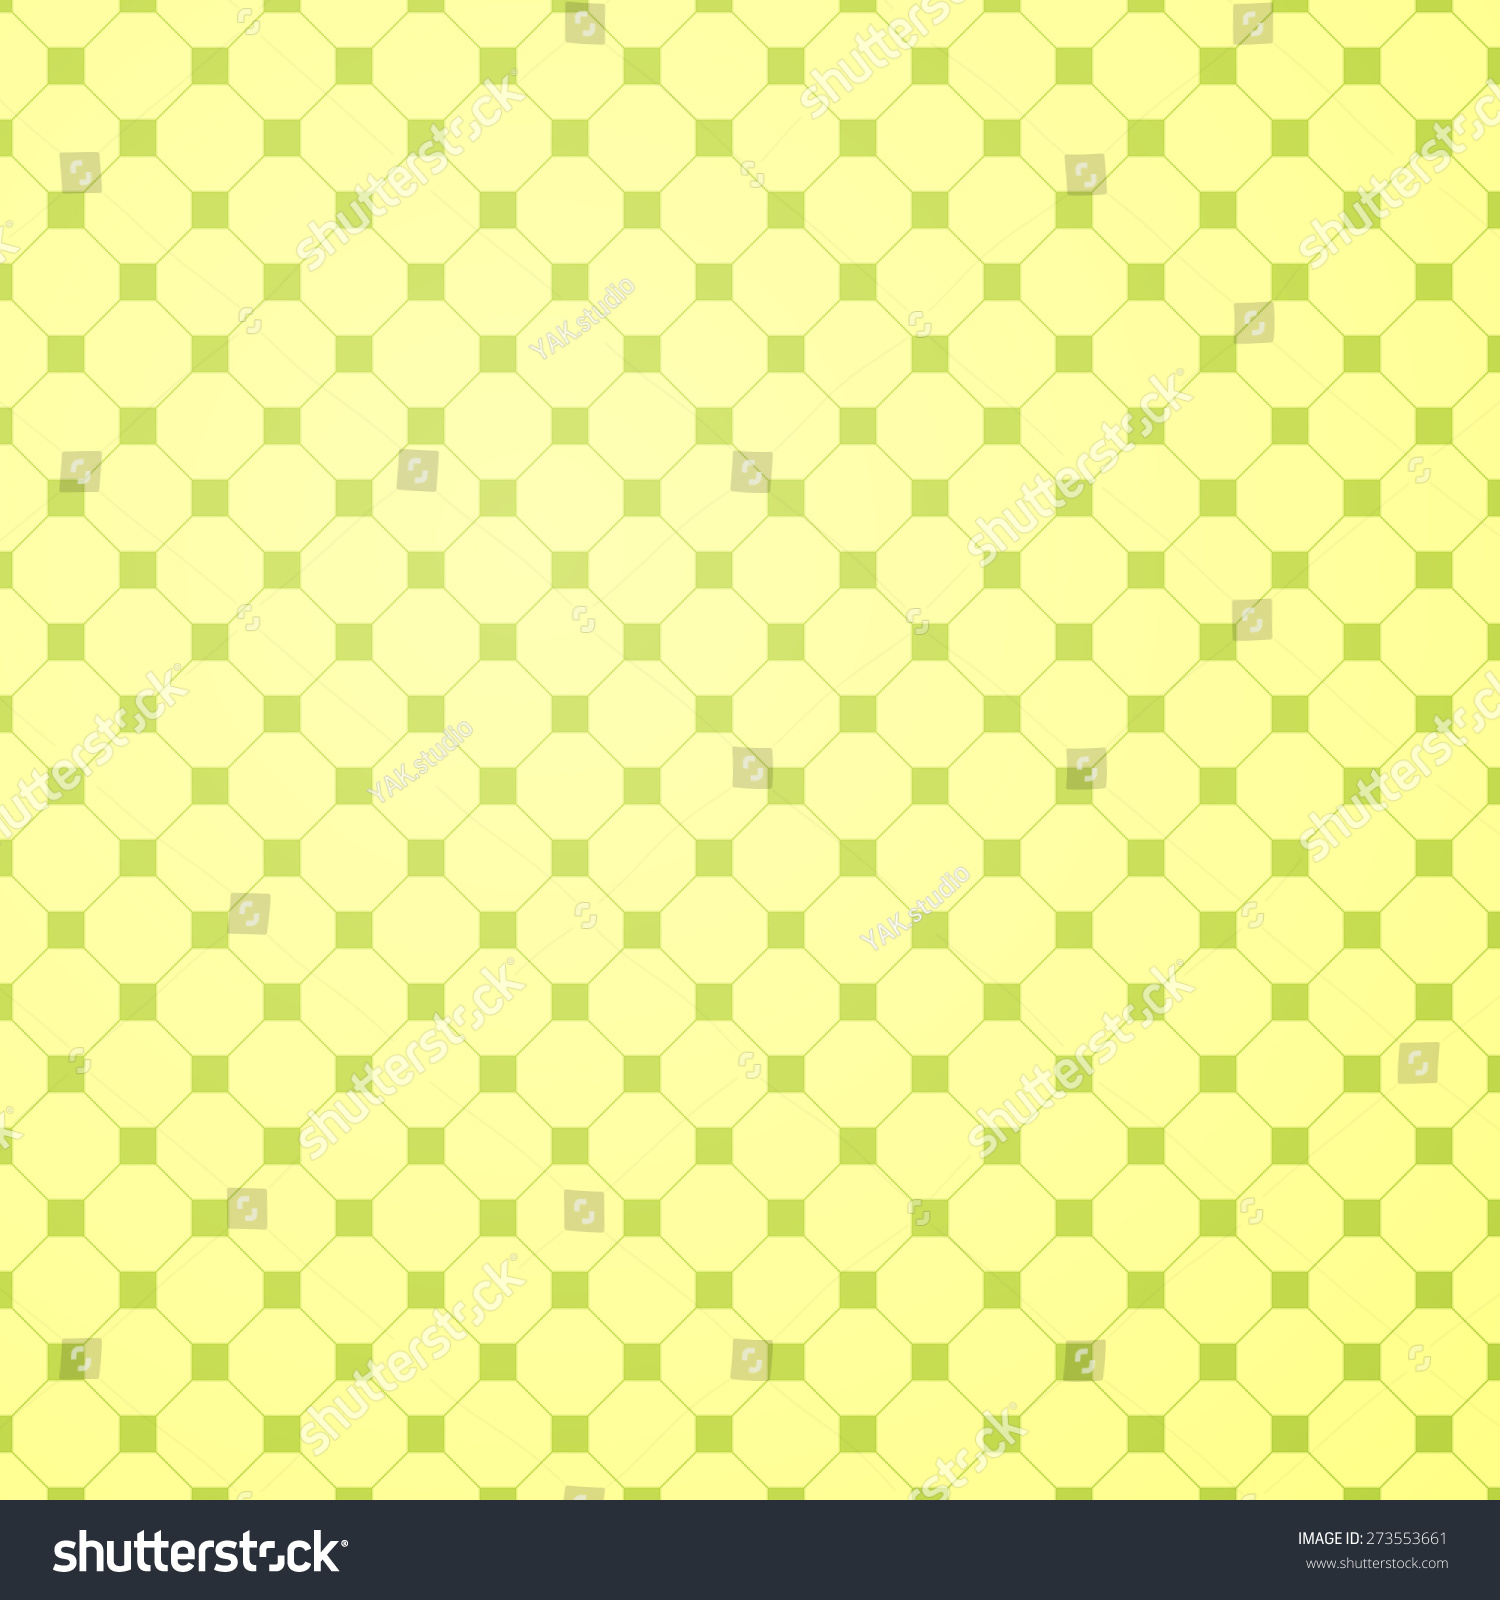 geometric yellow background illustration - photo #14